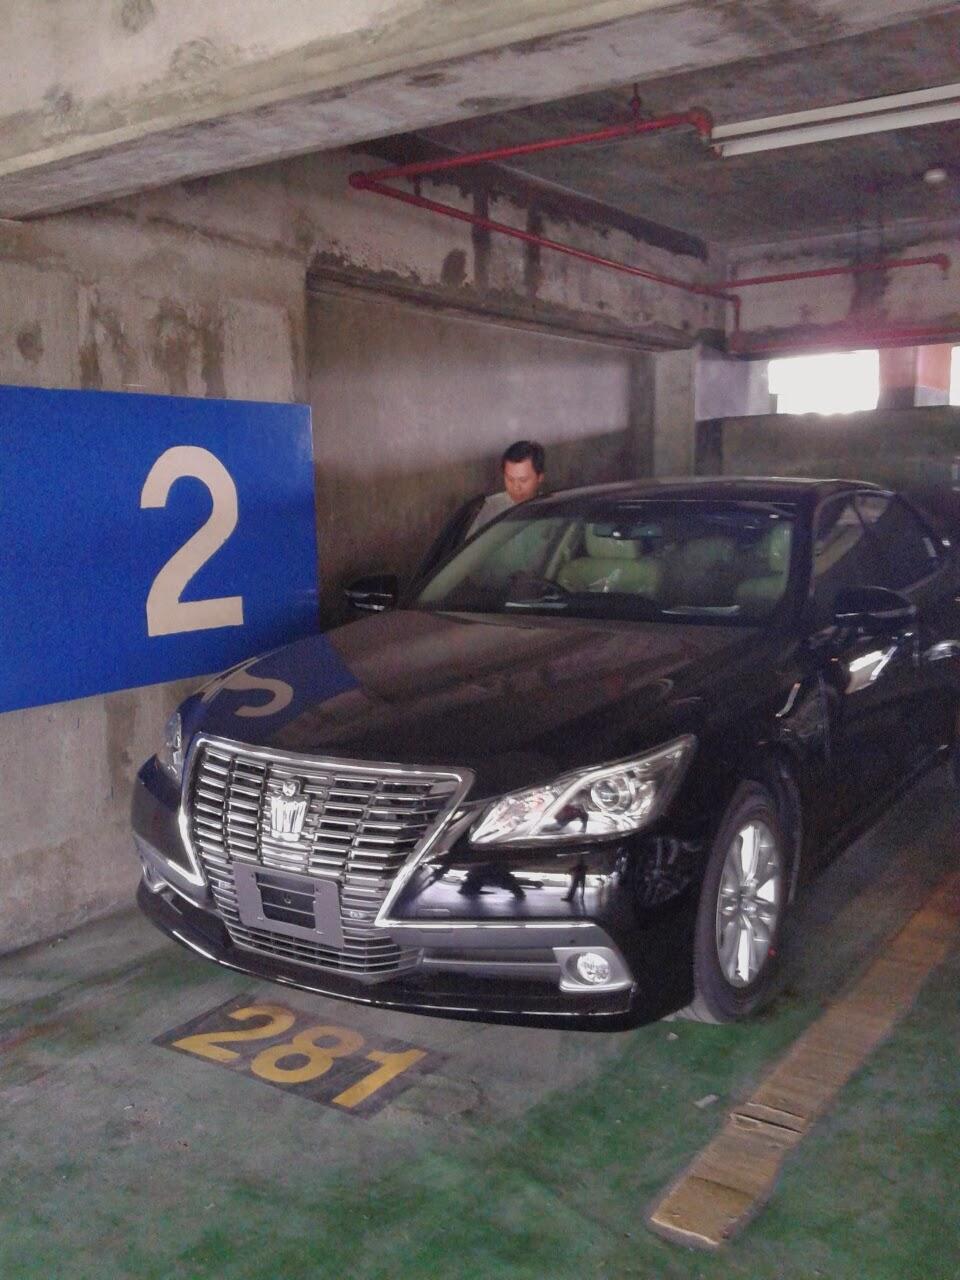 Jual All New Alphard Konsumsi Bbm Grand Veloz Beli Harga Toyota Jakarta: ...